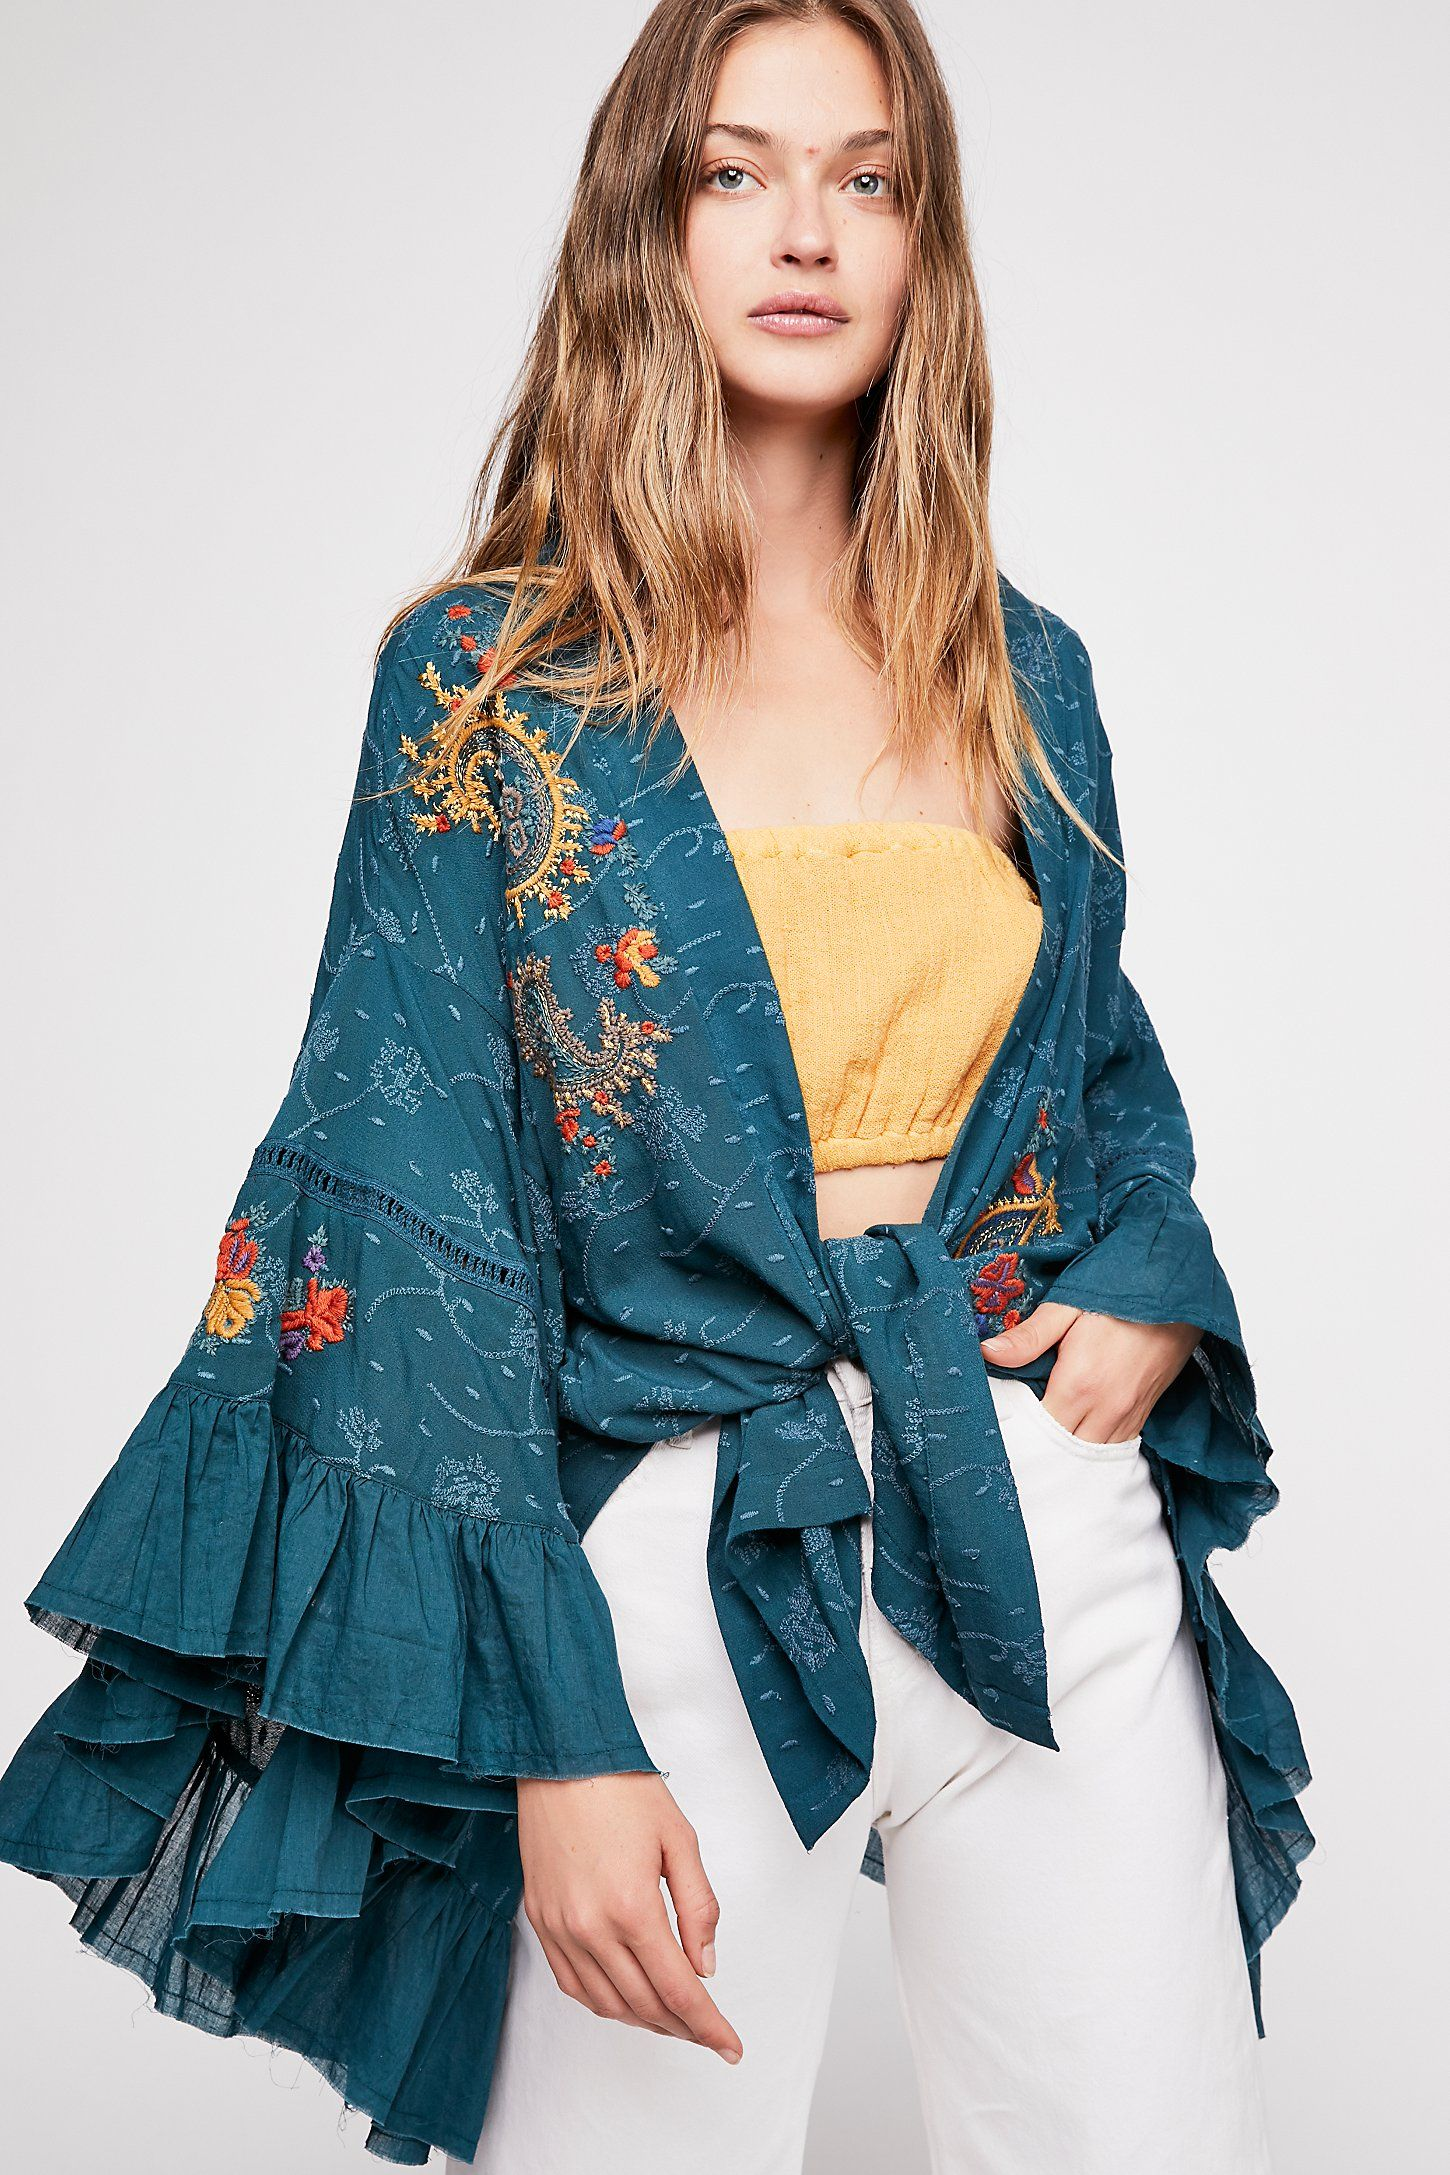 bd8ce6e57da Dottie West Kimono   My Style   Dottie west, Kimono, Kimono fashion